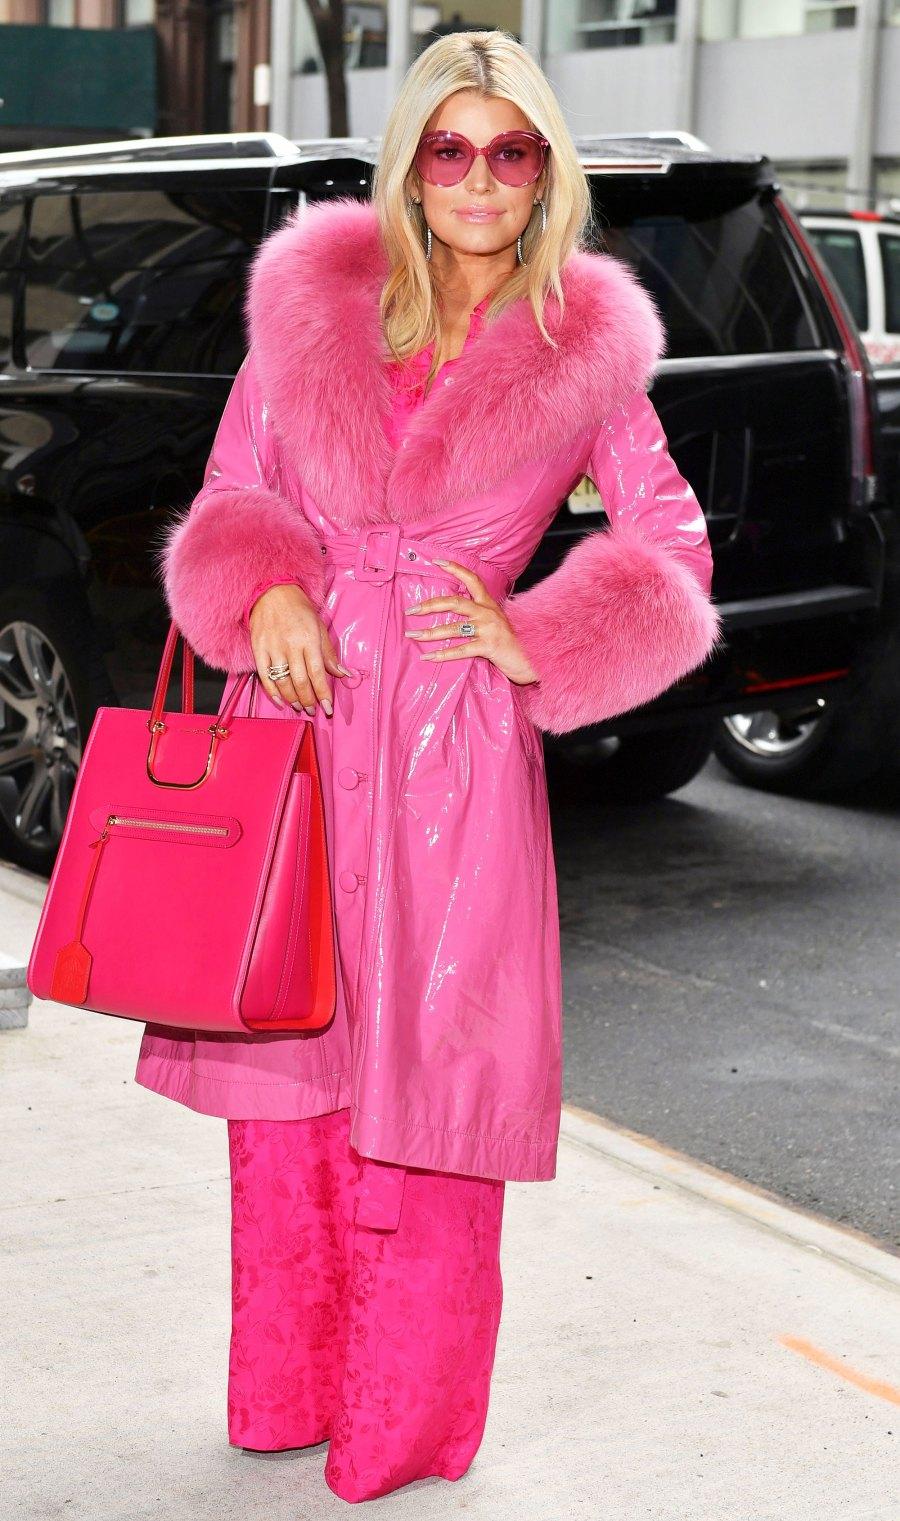 Jessica Simpson's Book Tour Style - February 4, 2020